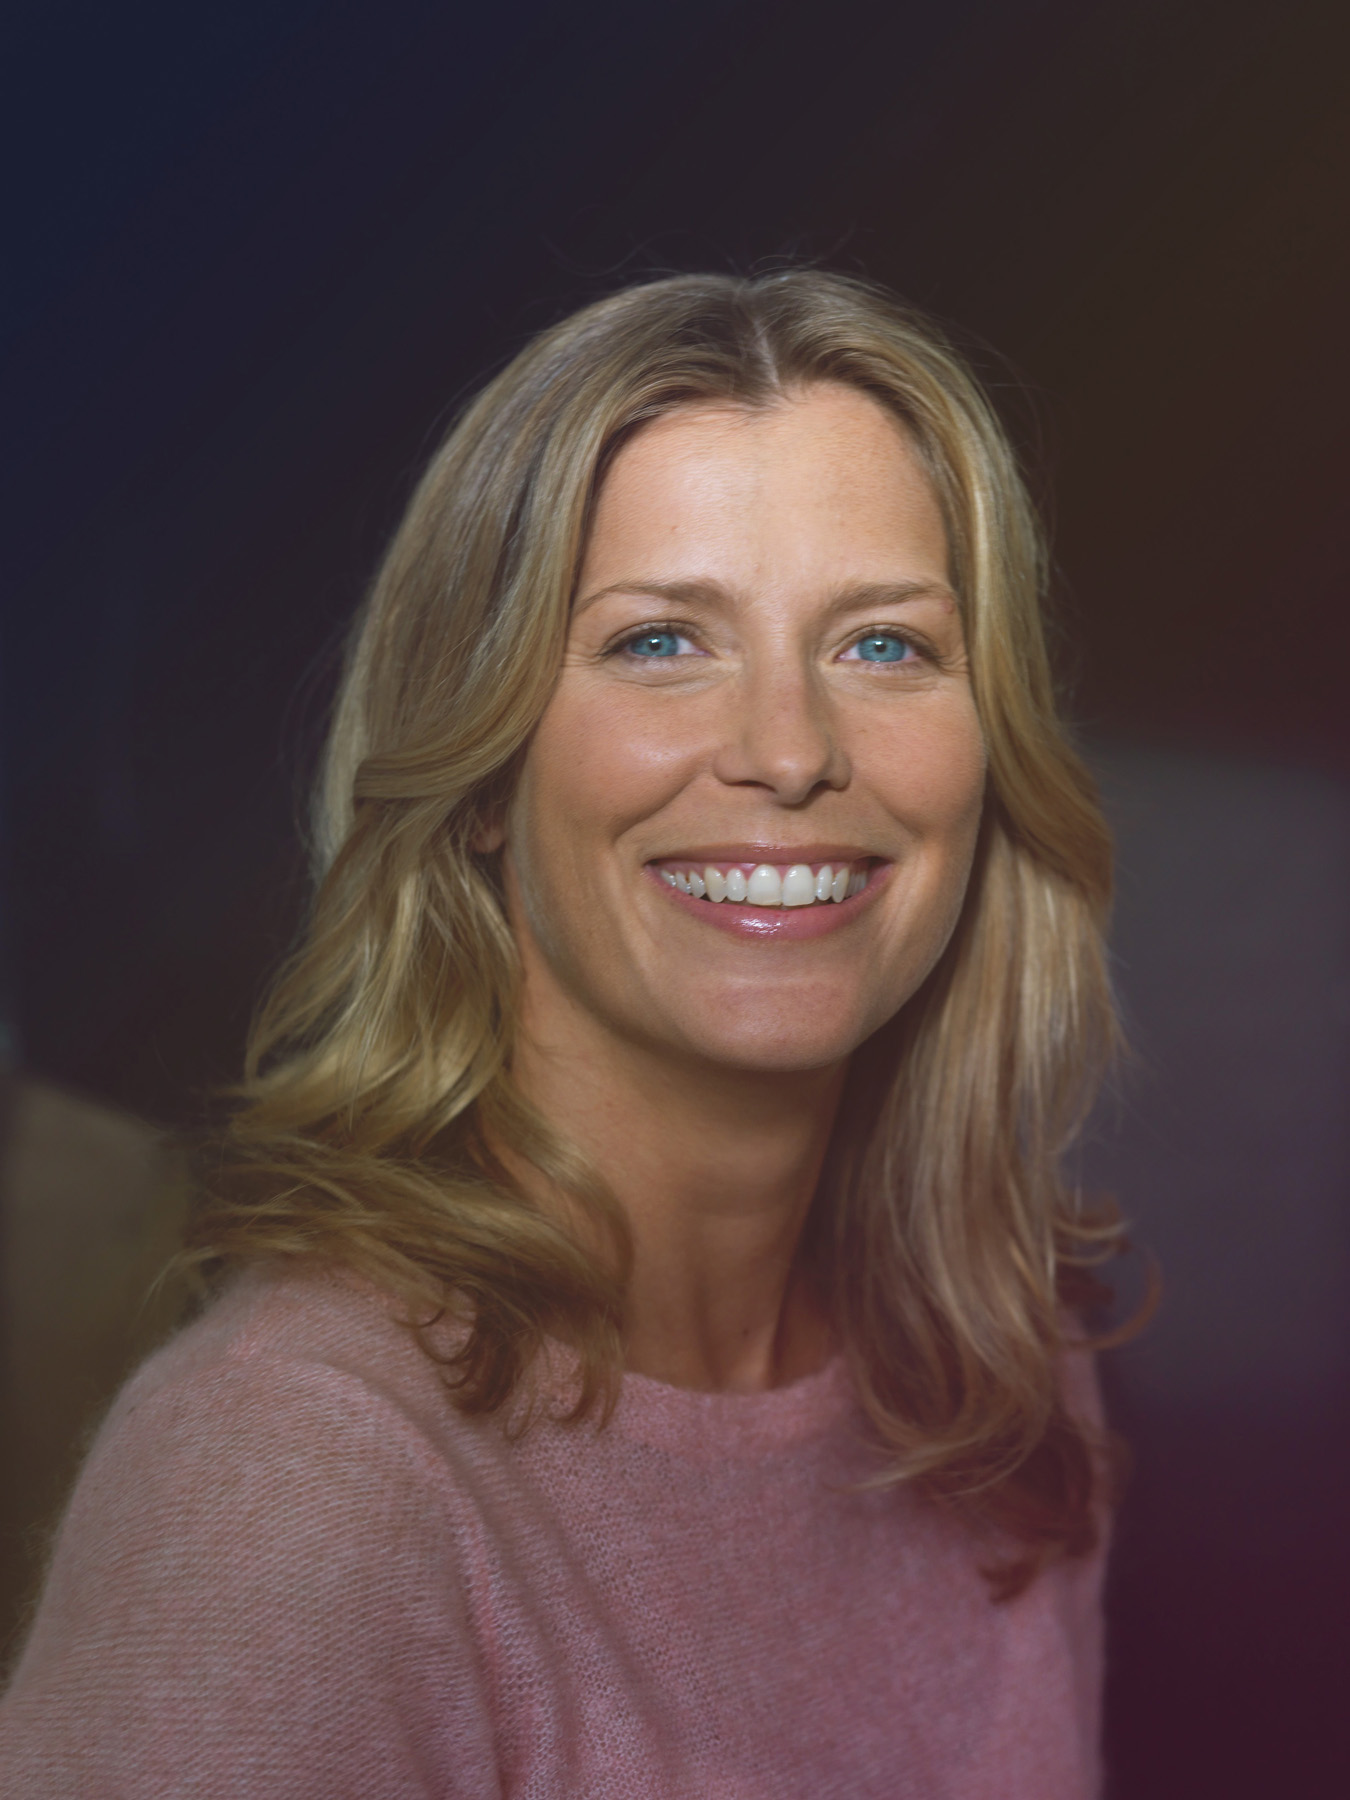 Valerie Niehaus – DAVID MAUPILÉ